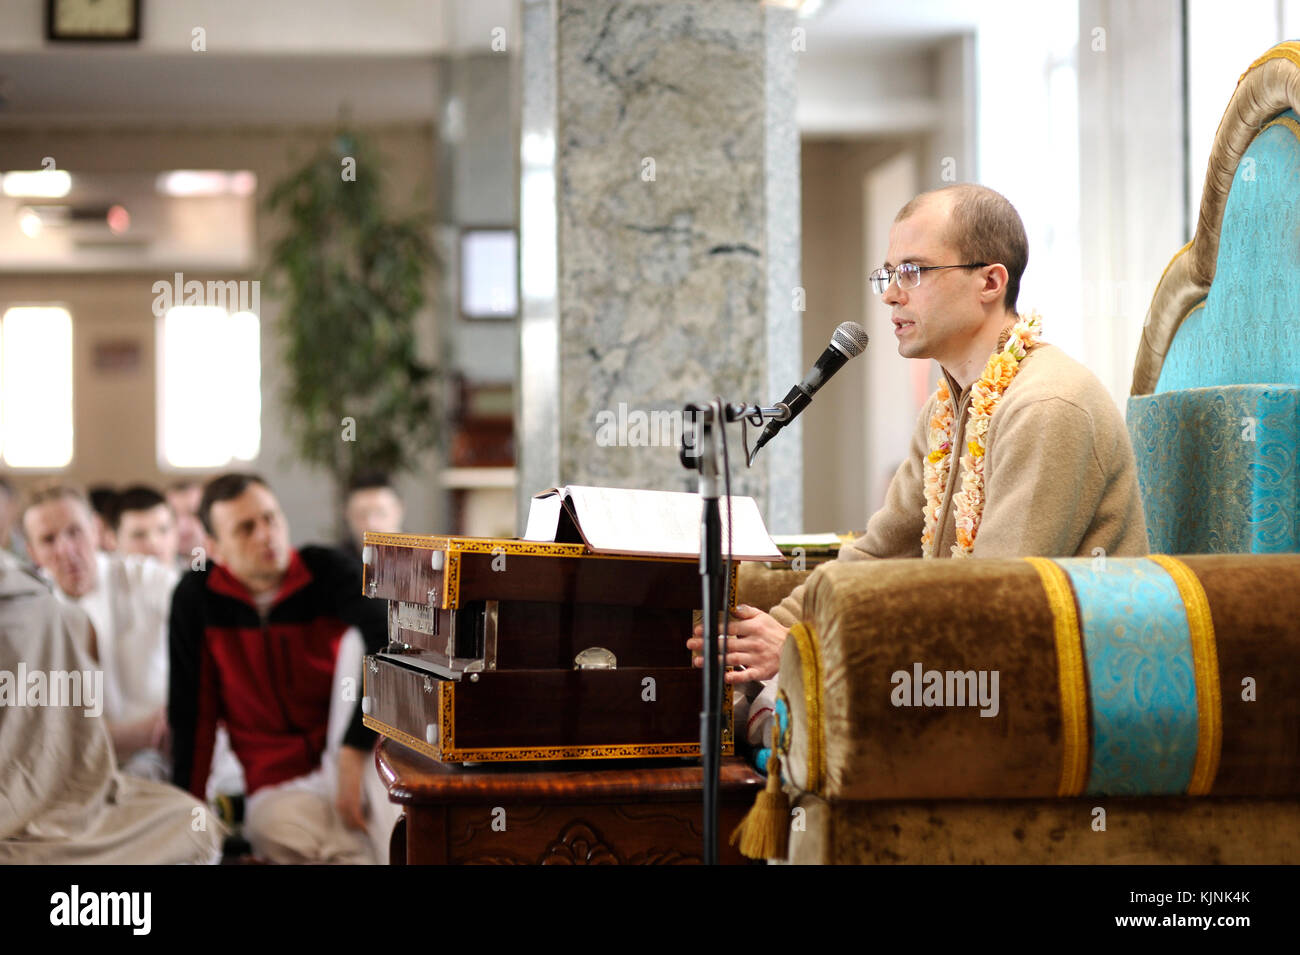 Guru preaching in a temple for Krishna parishioners. April 3, 2017. The Krishna temple, Kiyv, Ukraine - Stock Image